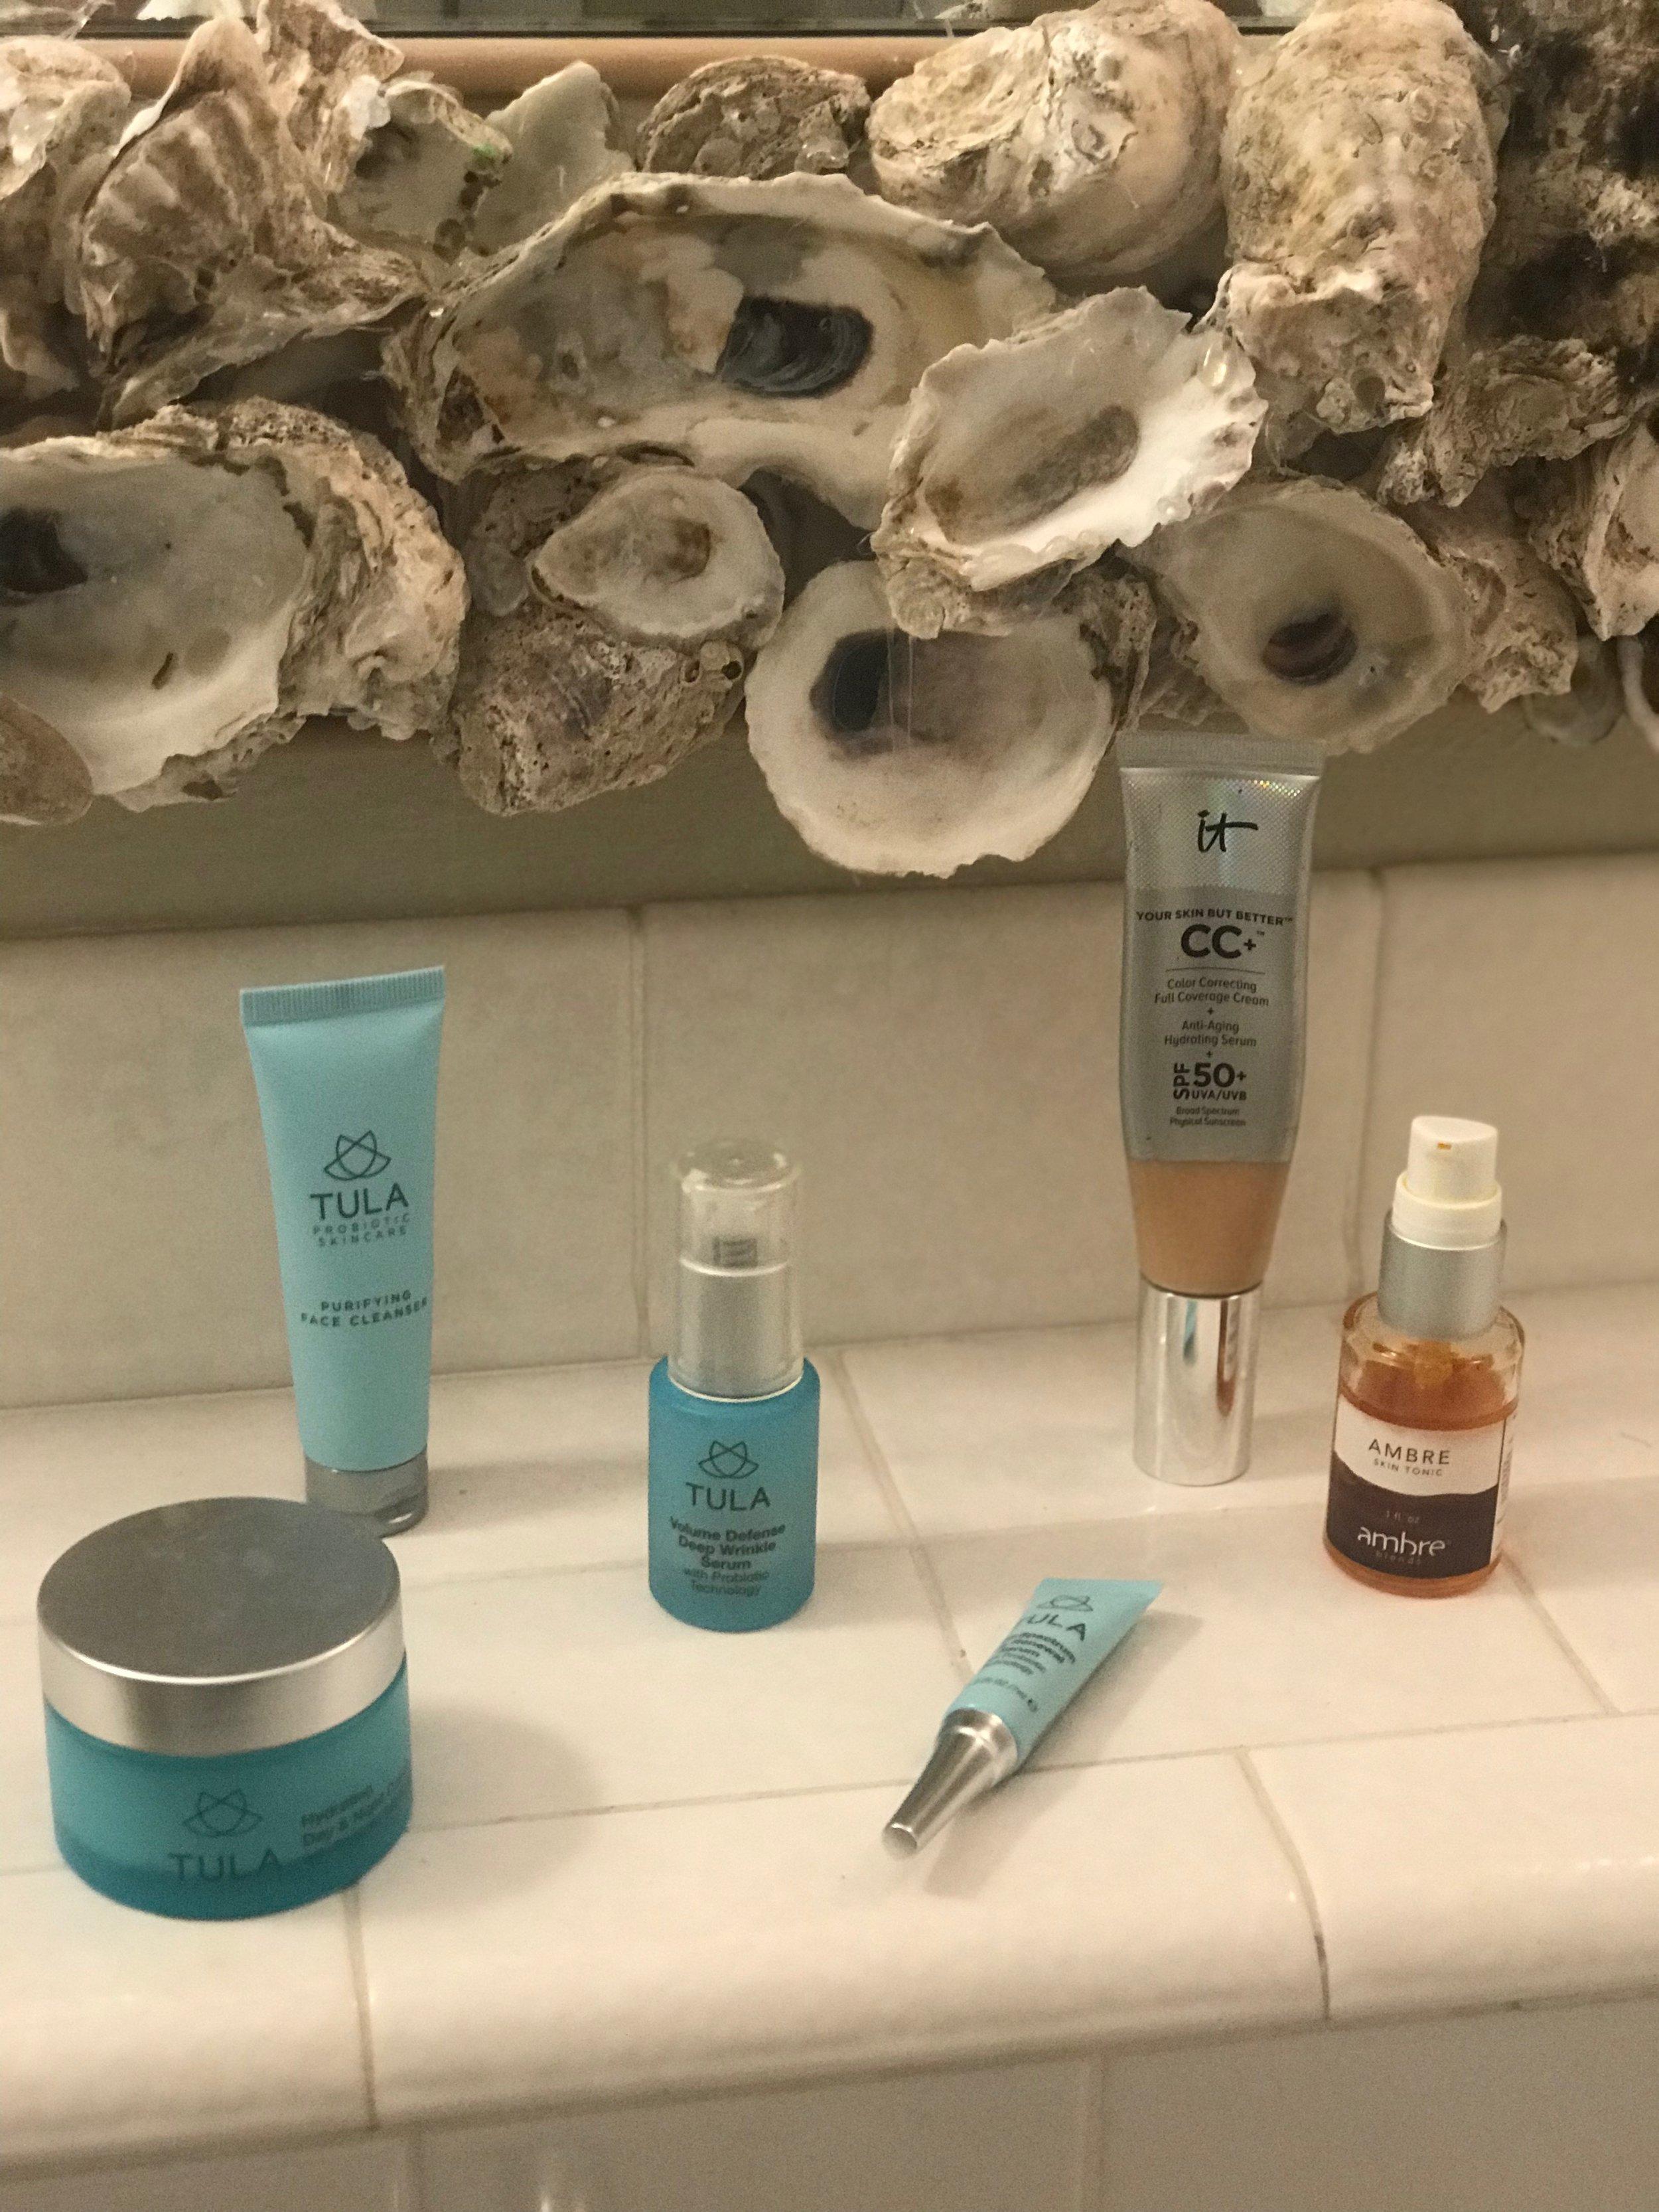 #SkinBabe Brooke Magdzinski Shares Her Favorite Products!